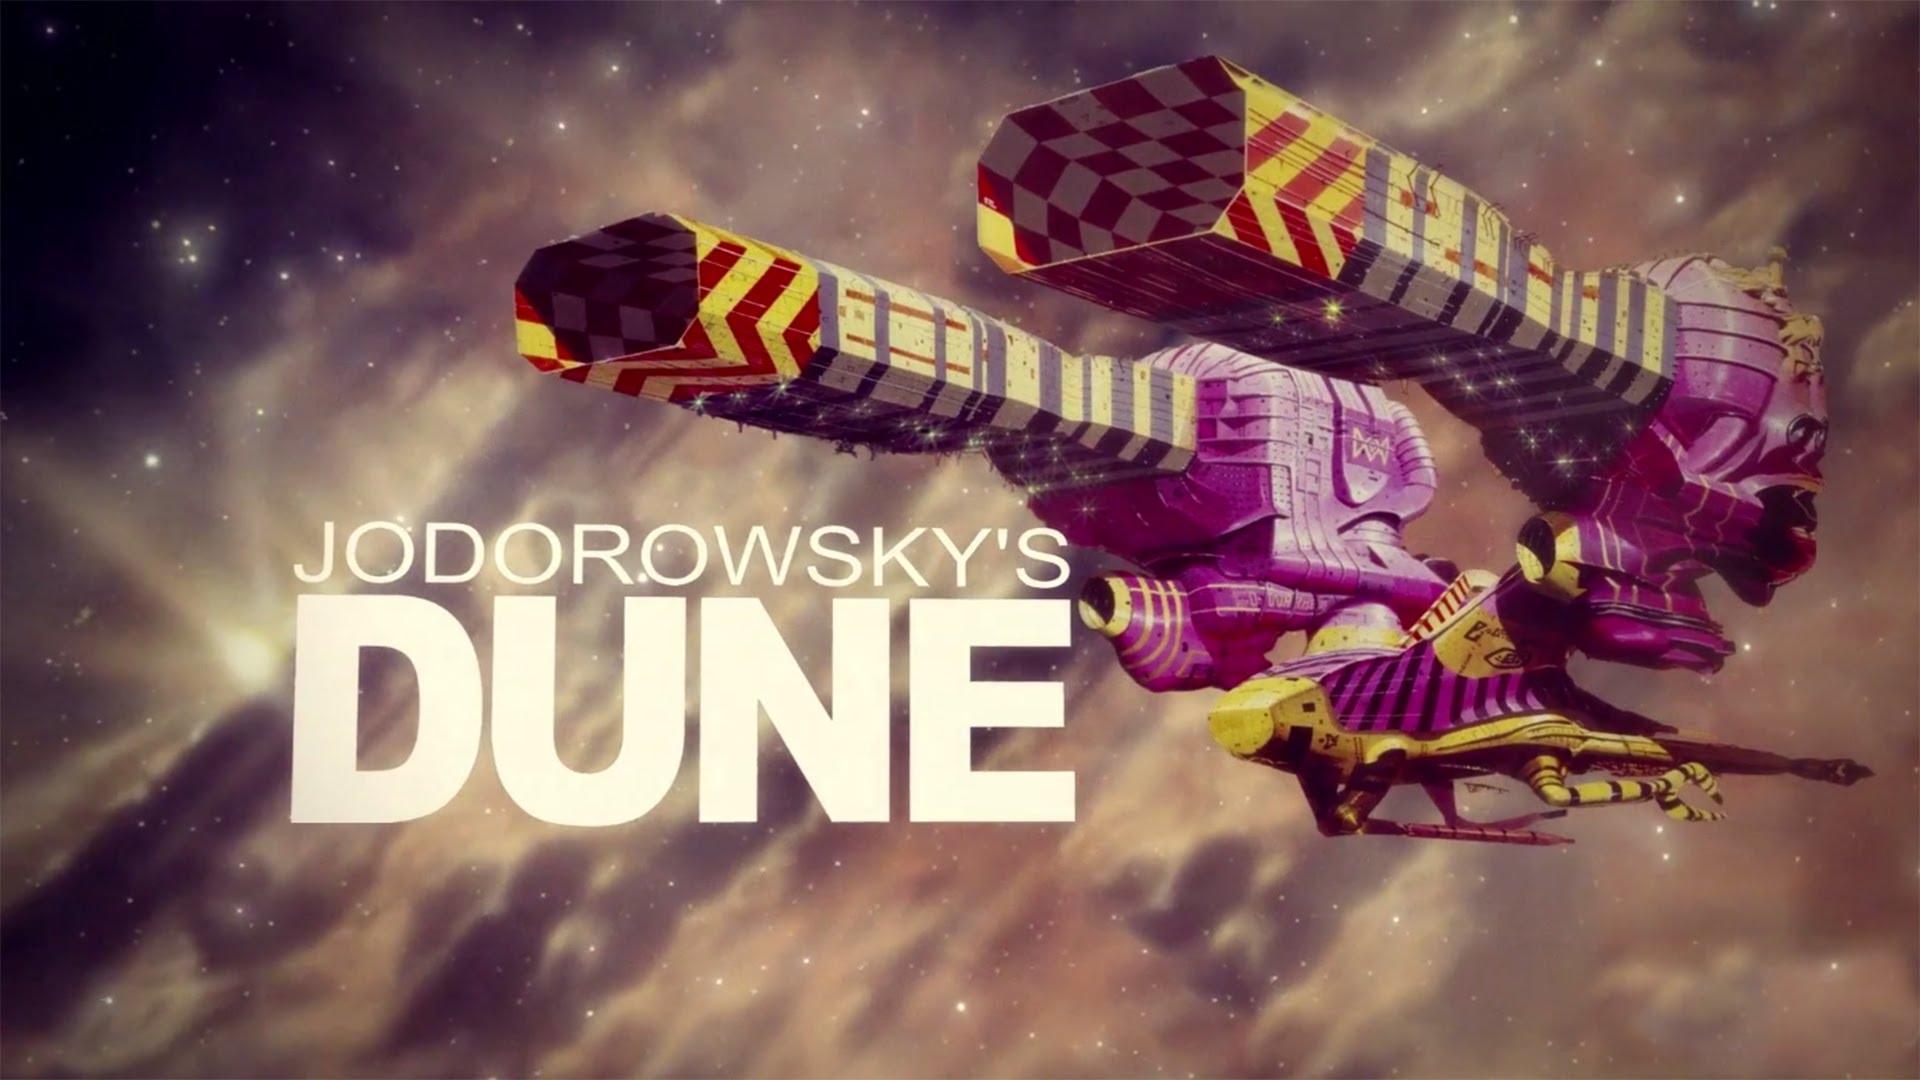 Jodorowsky's Dune - plakat.